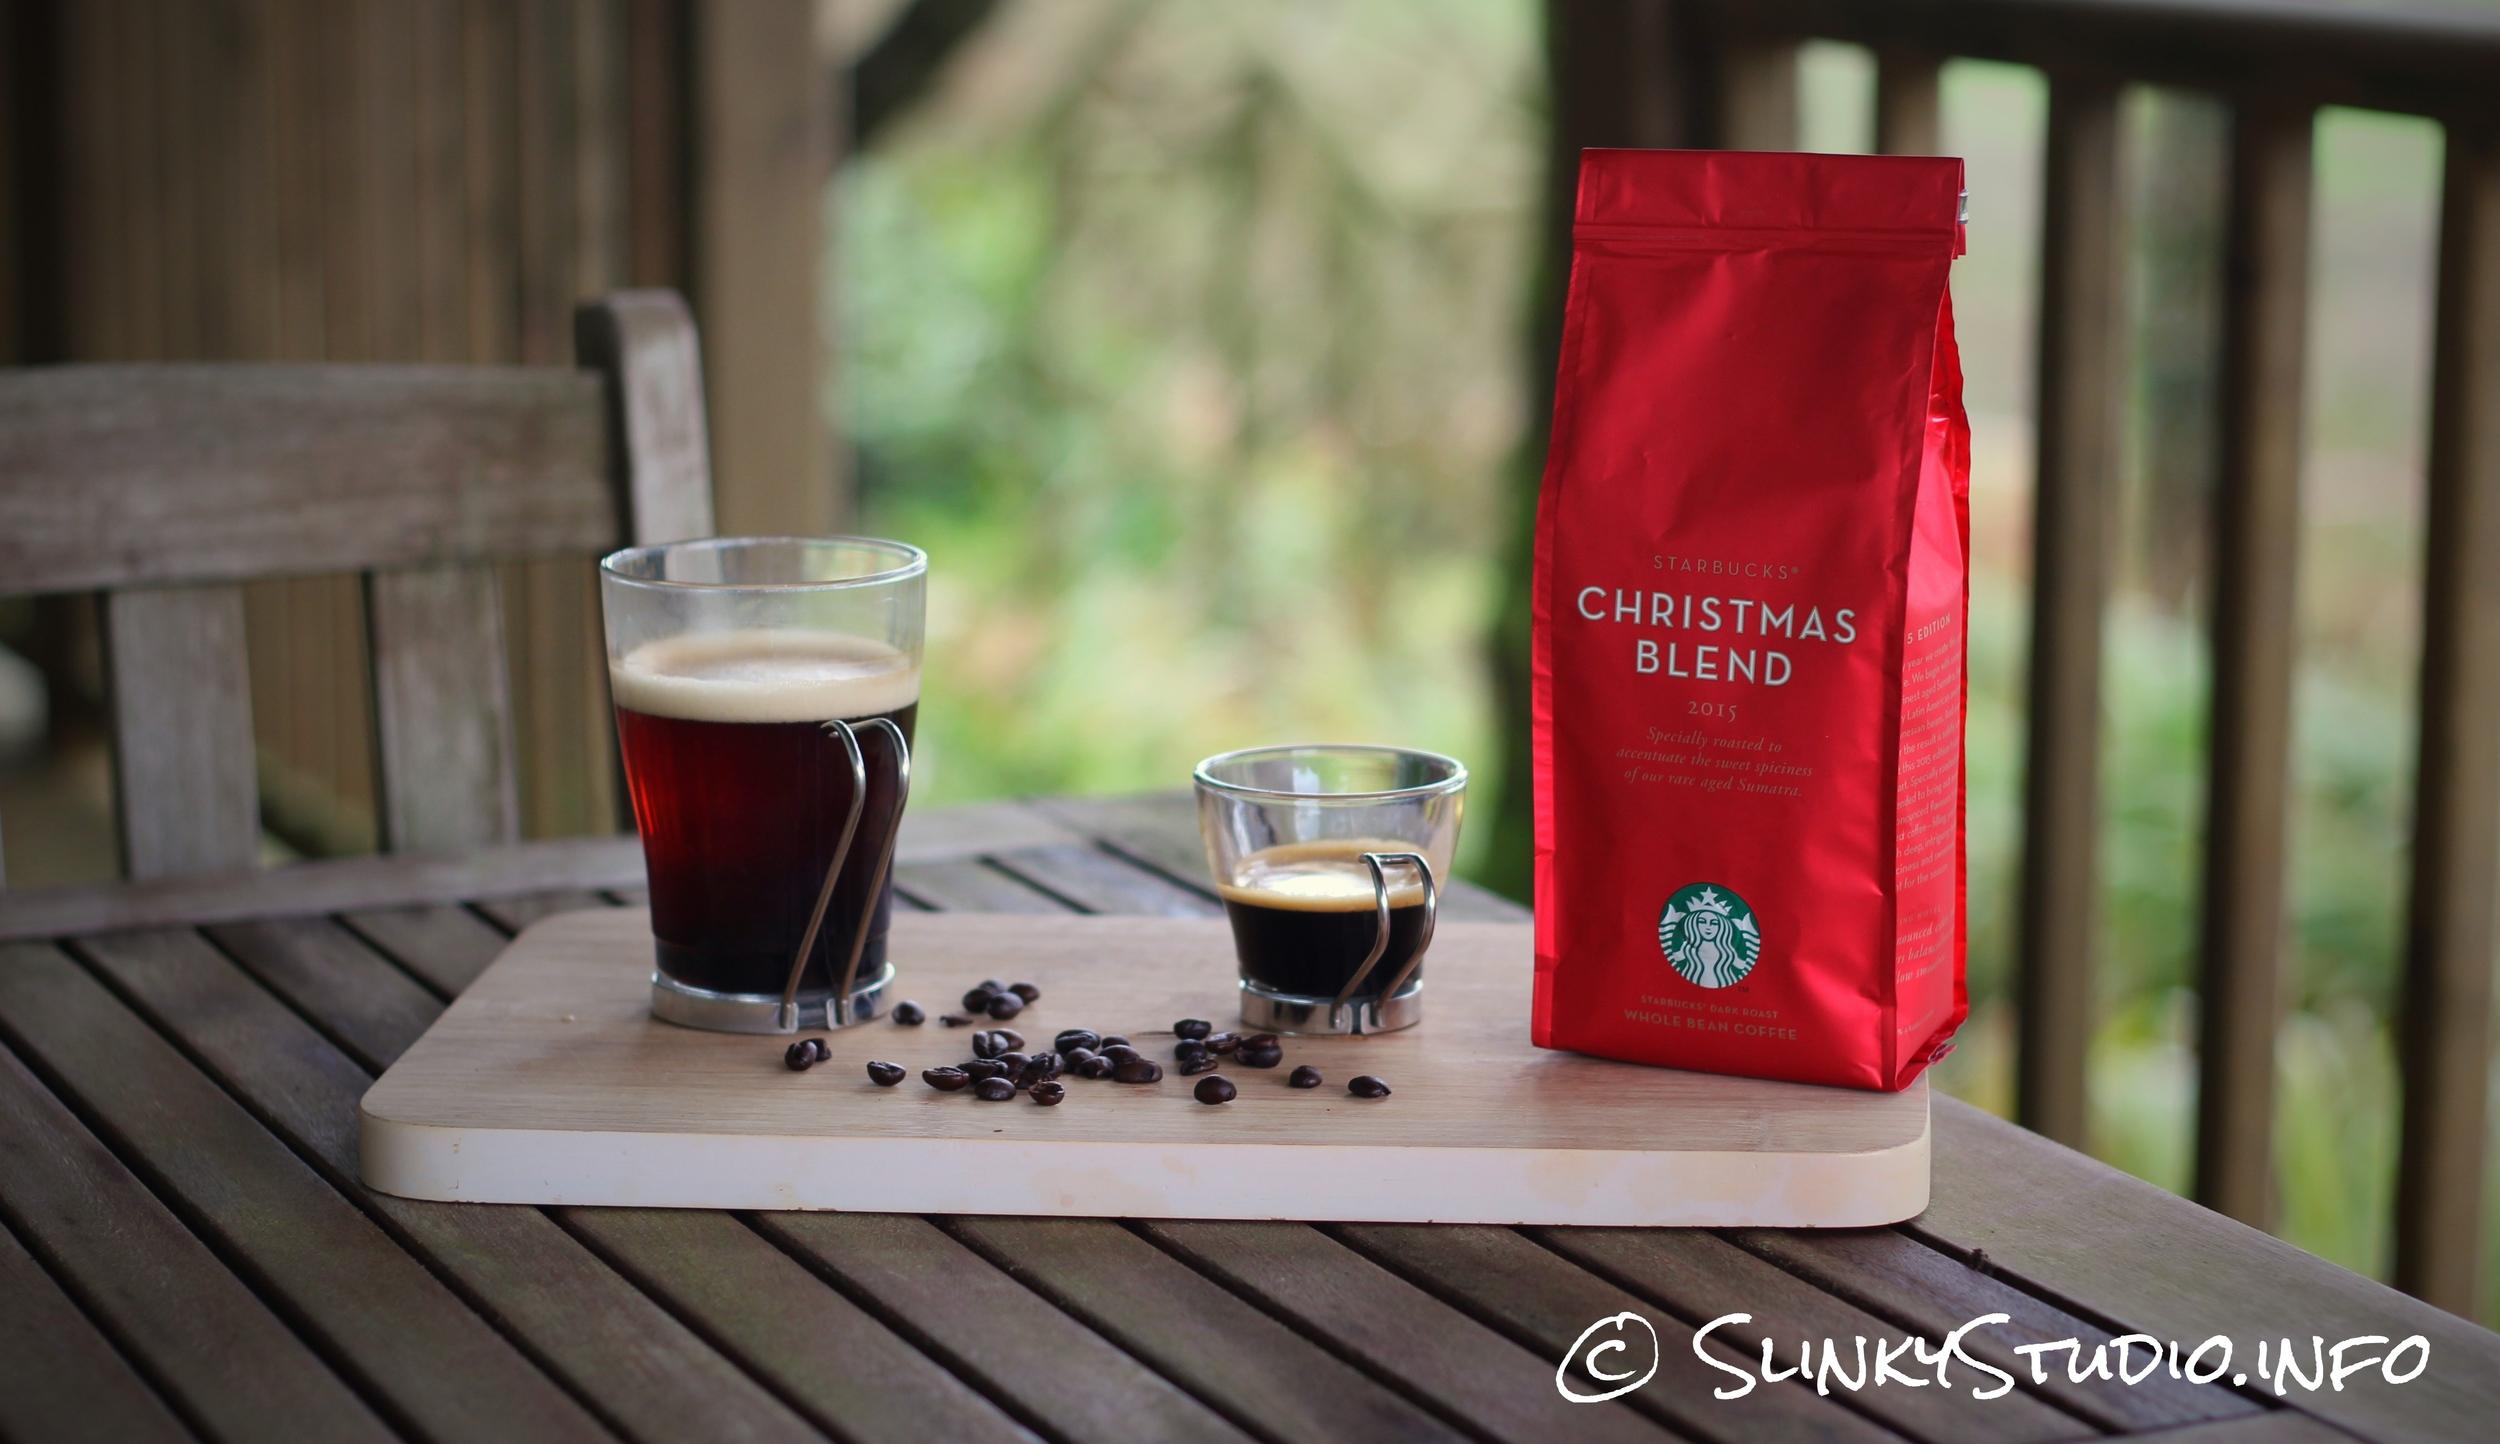 Starbucks Christmas Coffee.Starbucks Christmas Blend Review Slinky Studio